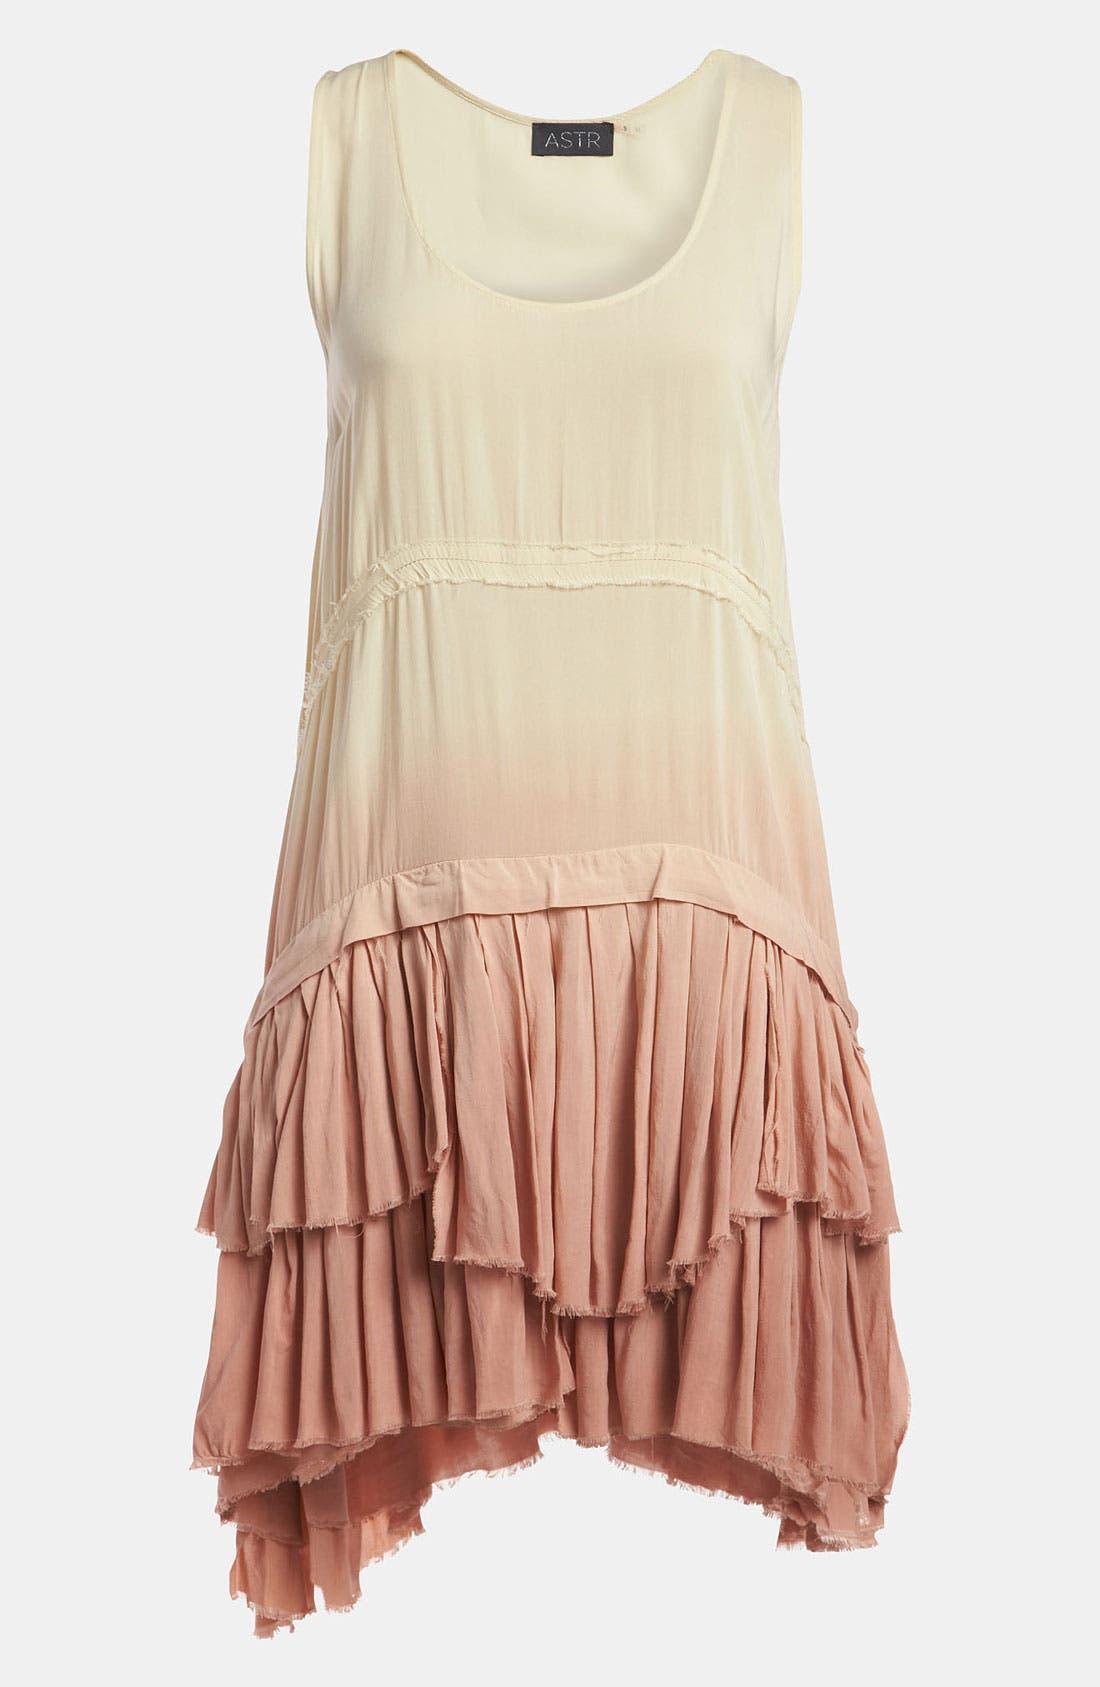 Alternate Image 1 Selected - ASTR 'Ra Ra Ruffle' Dip Dye Tank Dress